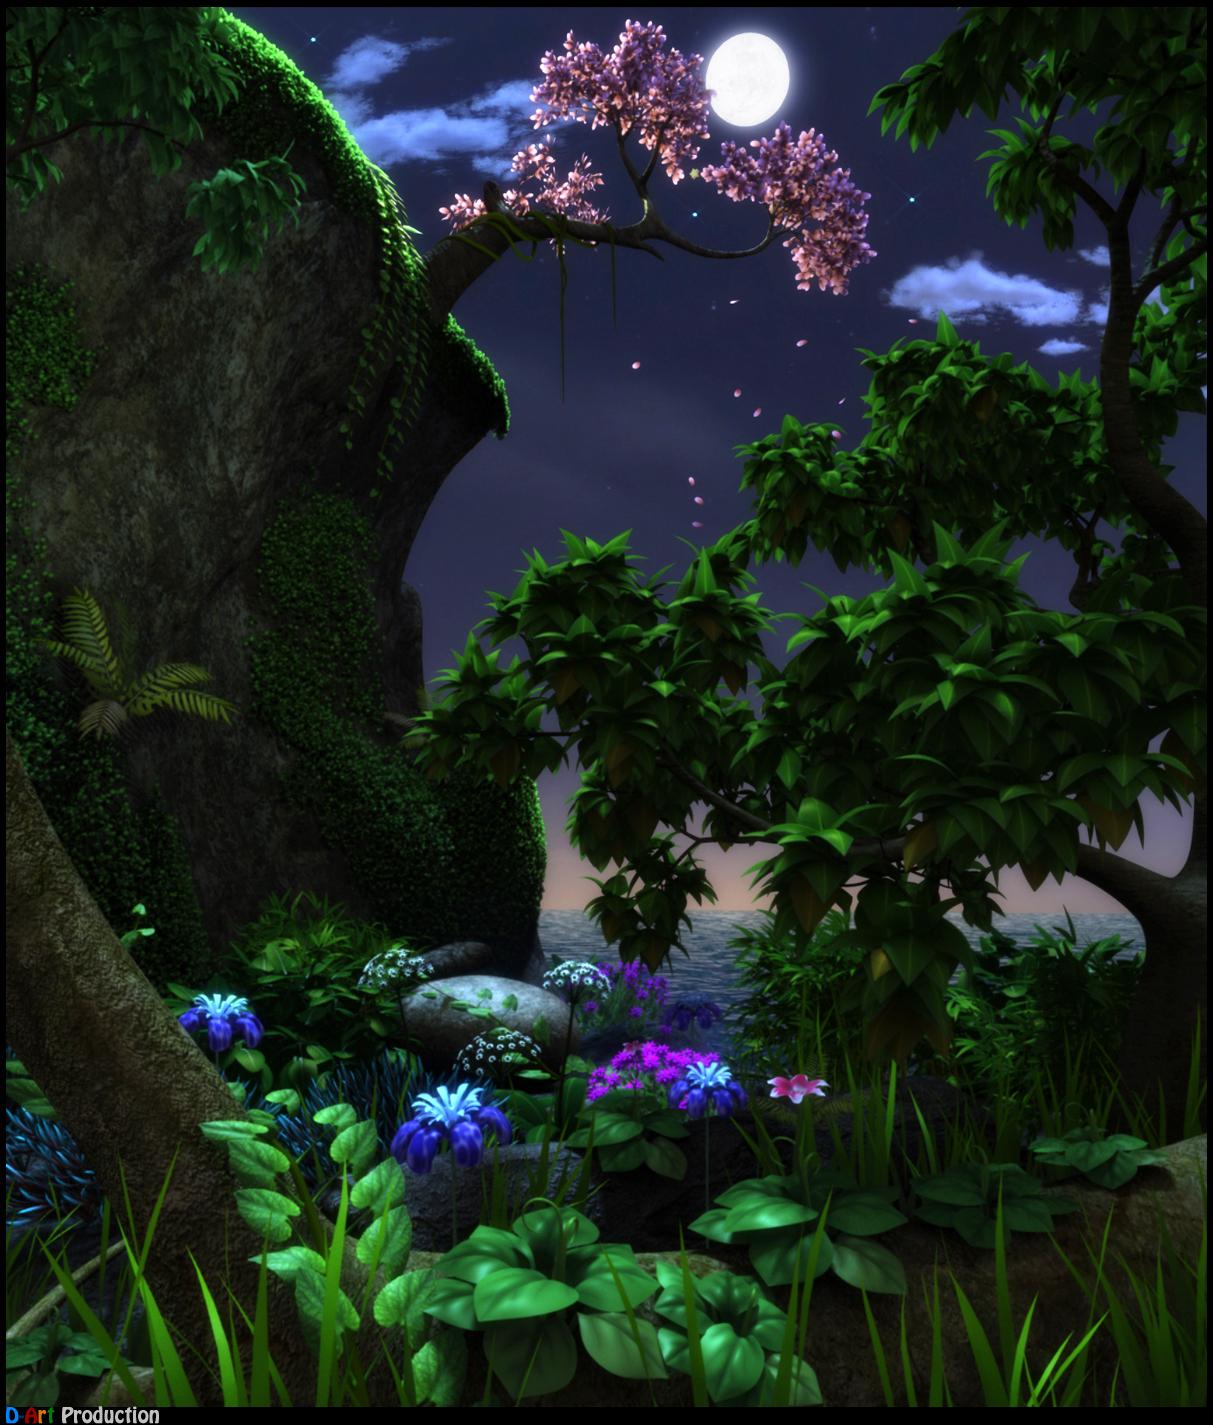 nature at night by dart12001